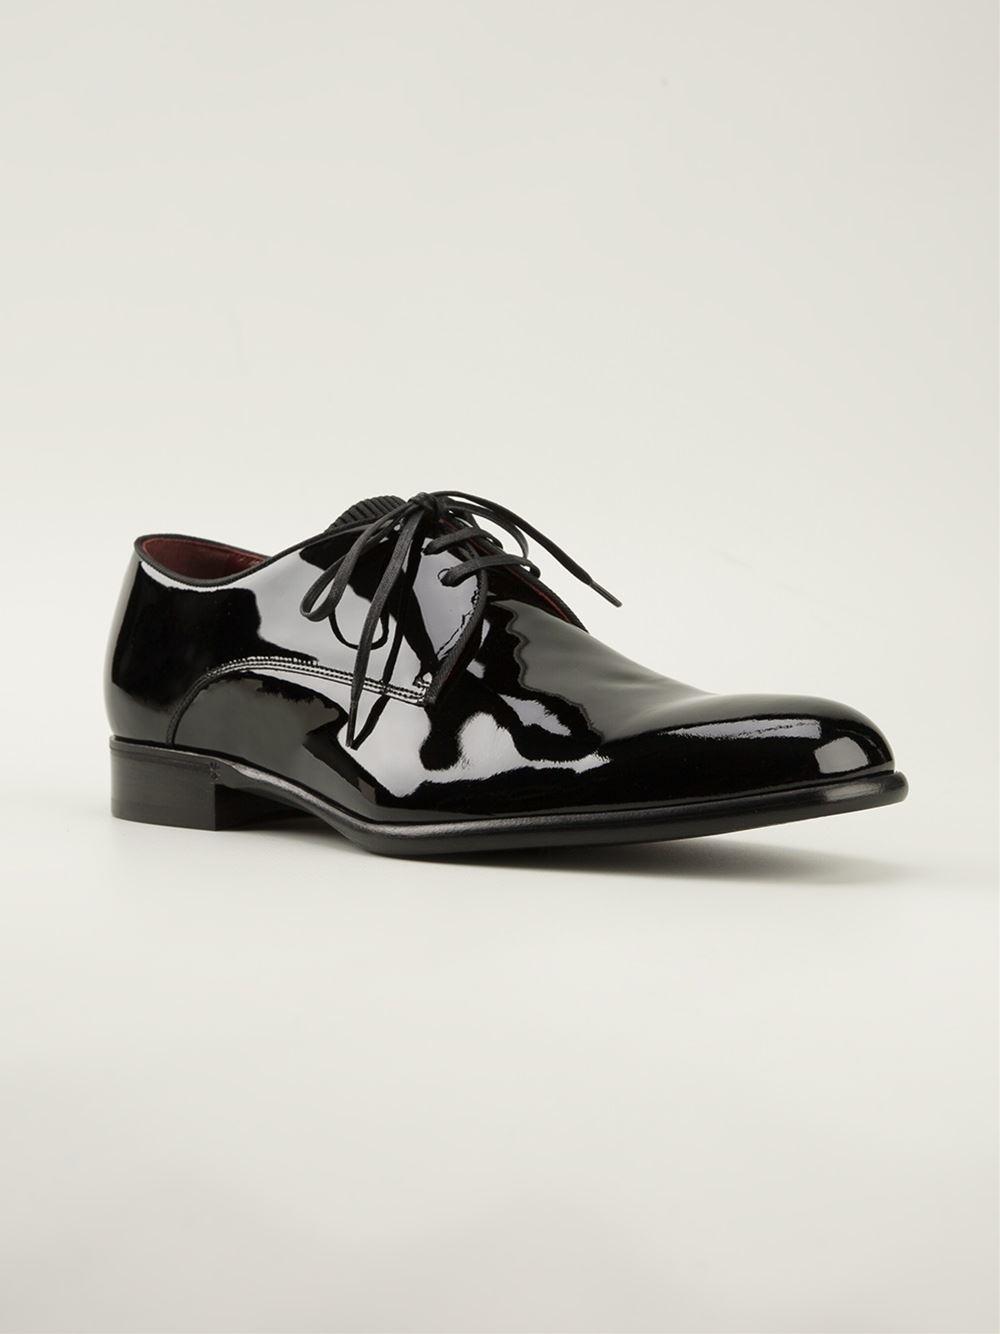 Dolce \u0026 Gabbana Patent Derby Shoes in